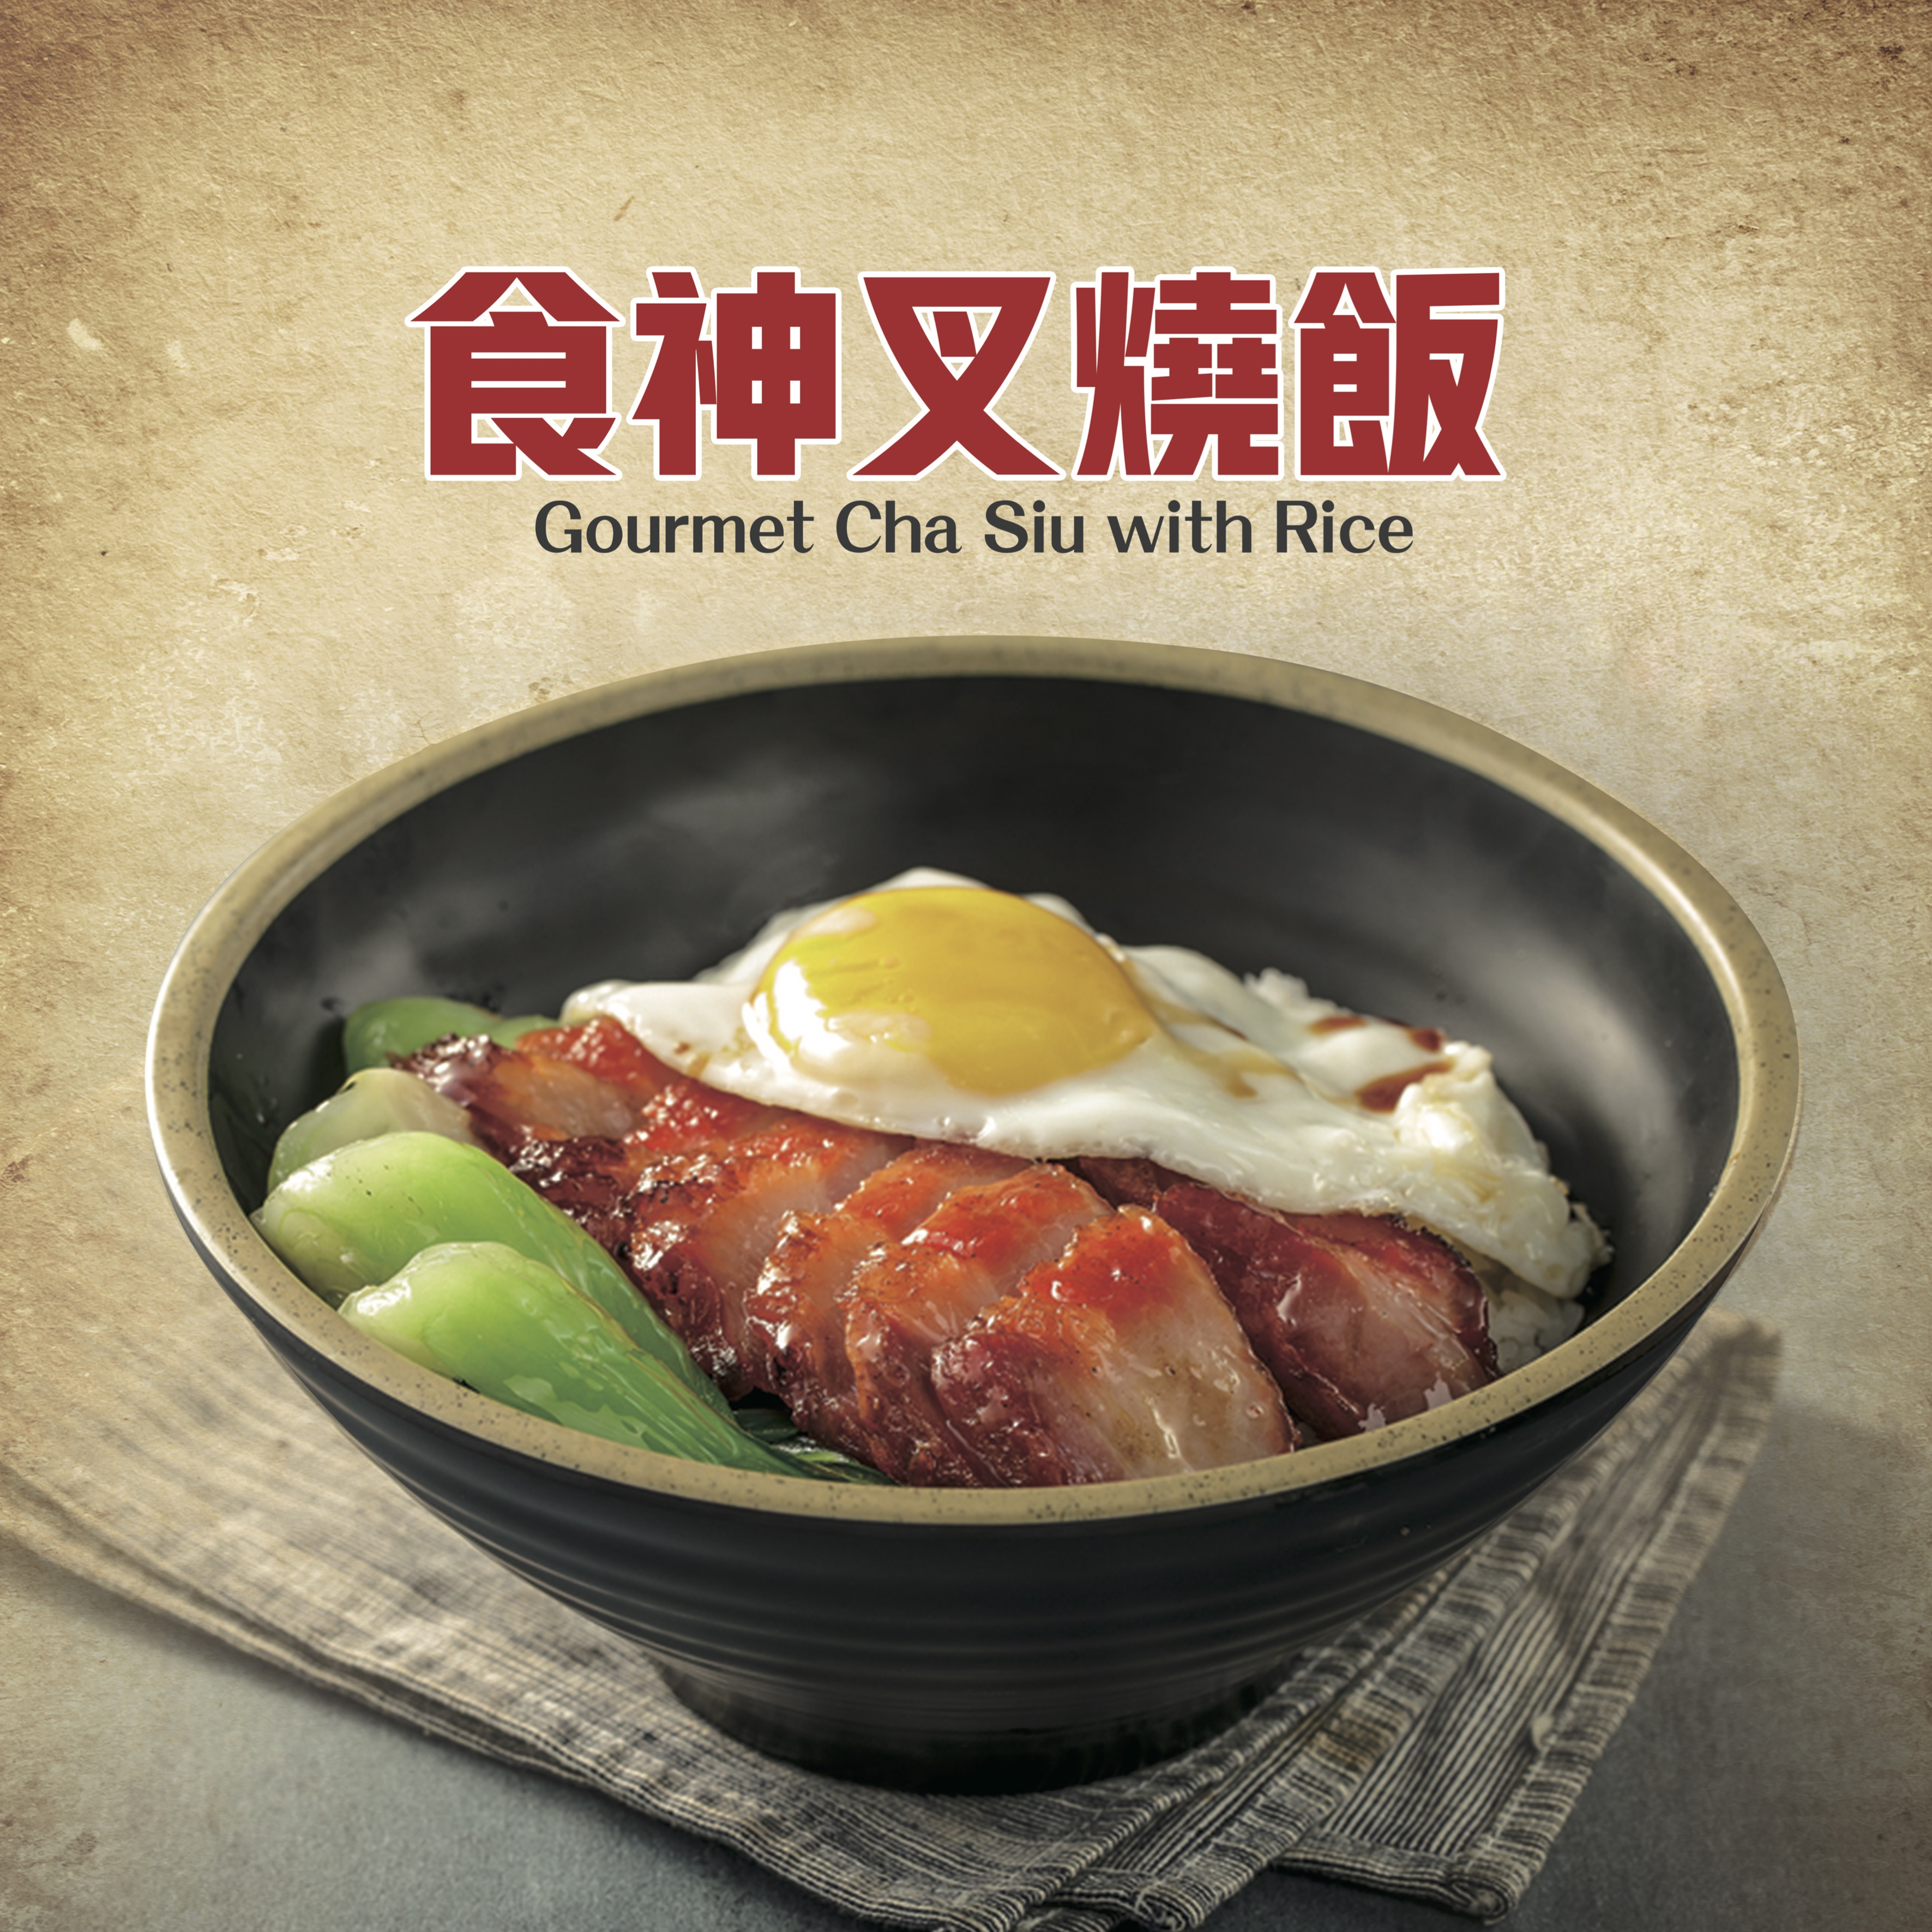 Gourmet Cha Siu with Rice